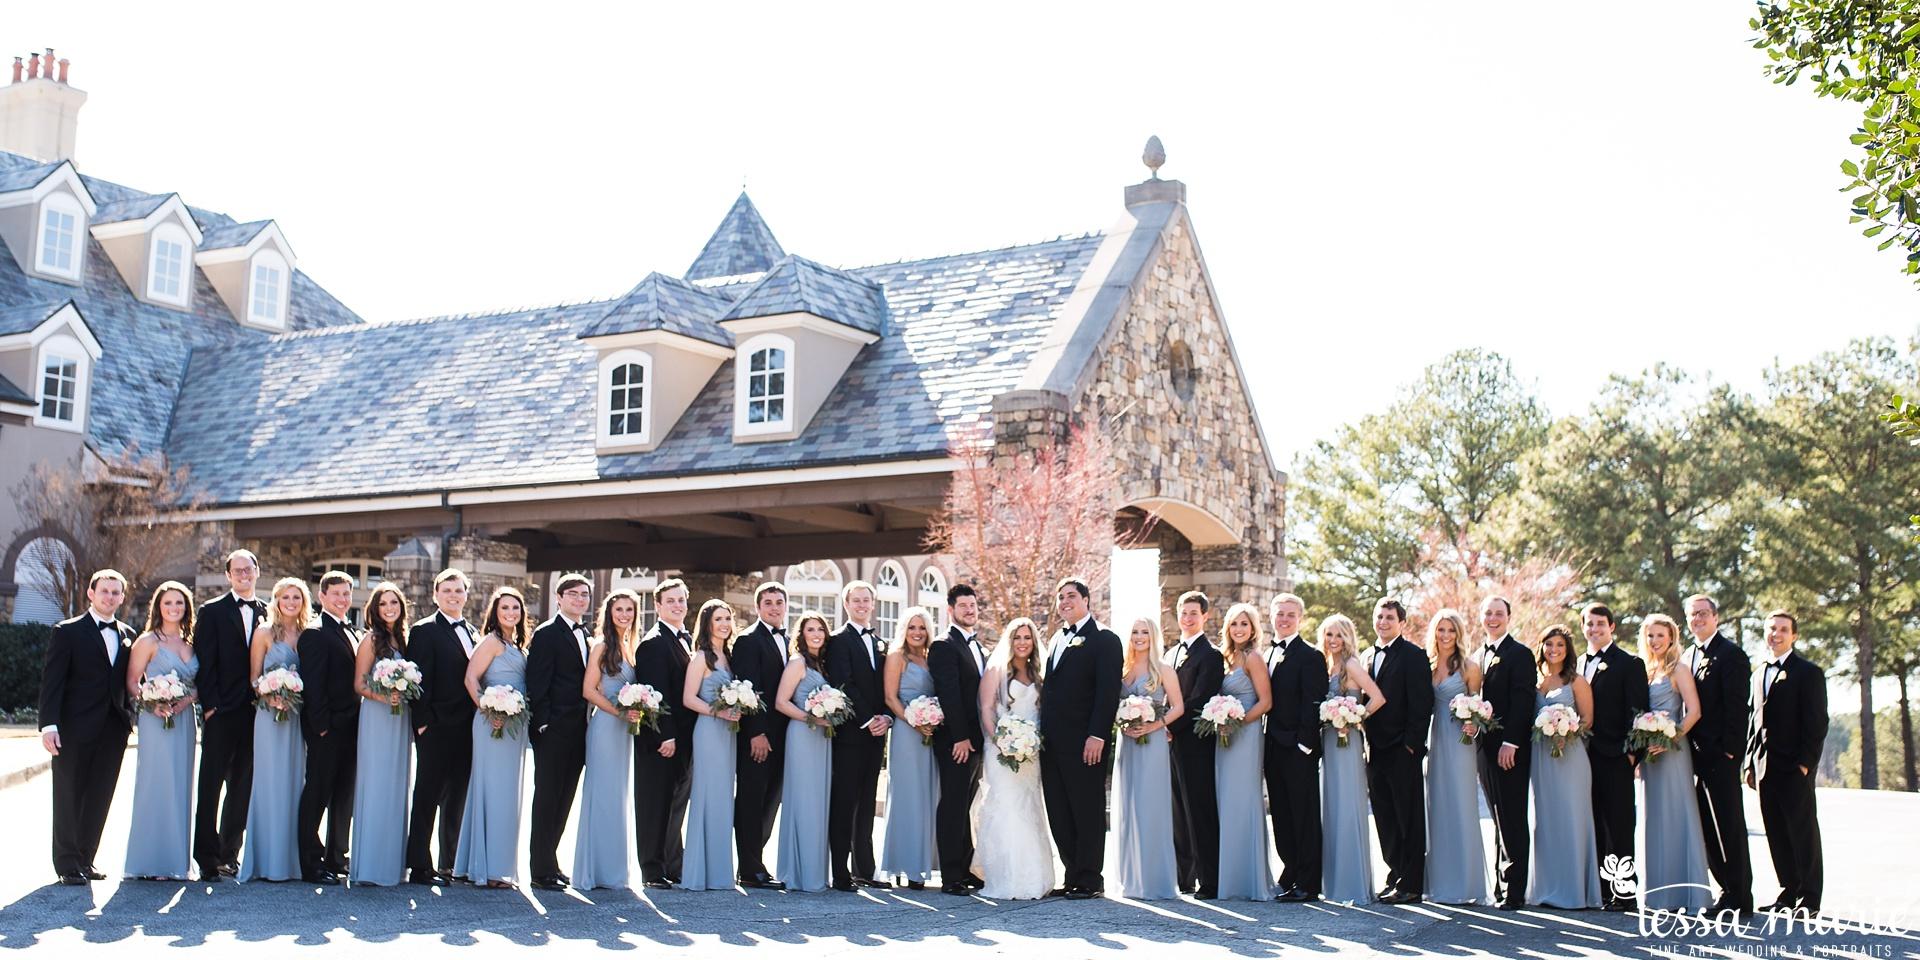 tessa_marie_legacy_moments_storytelling_candid_emotionally_driven_wedding_photographer_atlanta_wedding_photography_st_ives_country_club_wedding_boukates_bridals_by_lori_0026